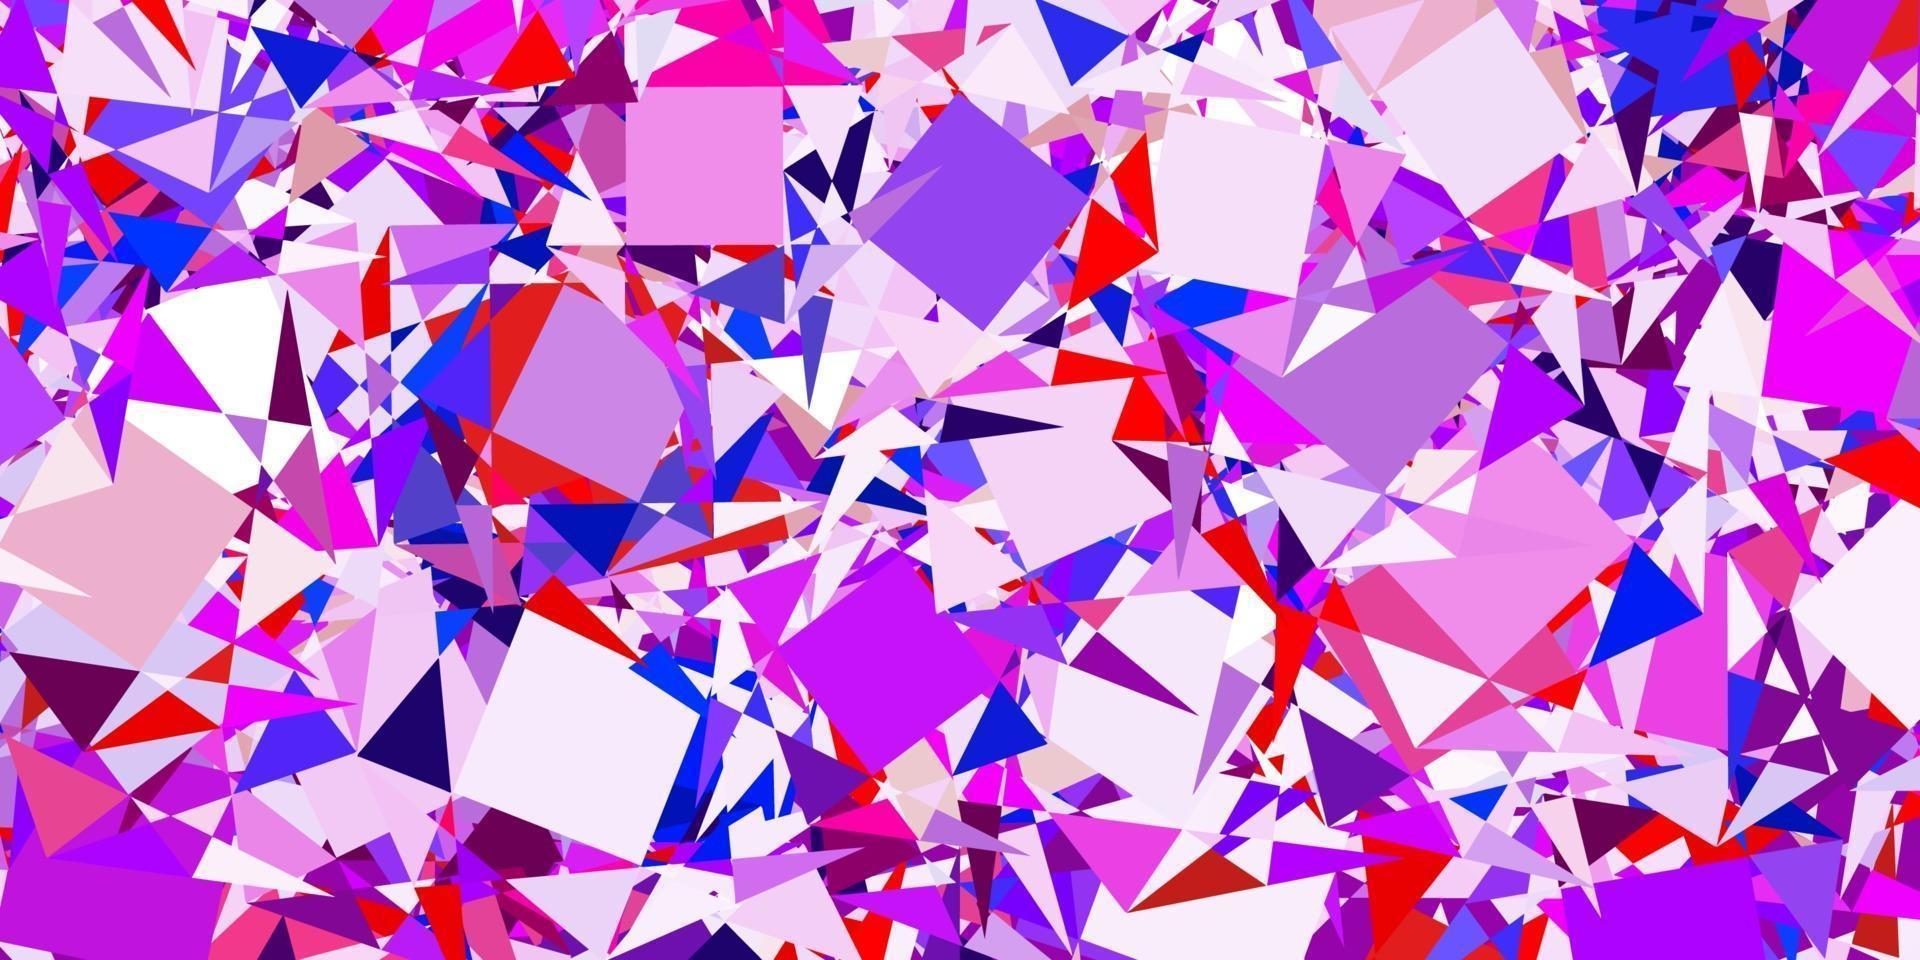 lichtblauwe, rode vectorlay-out met driehoeksvormen. vector